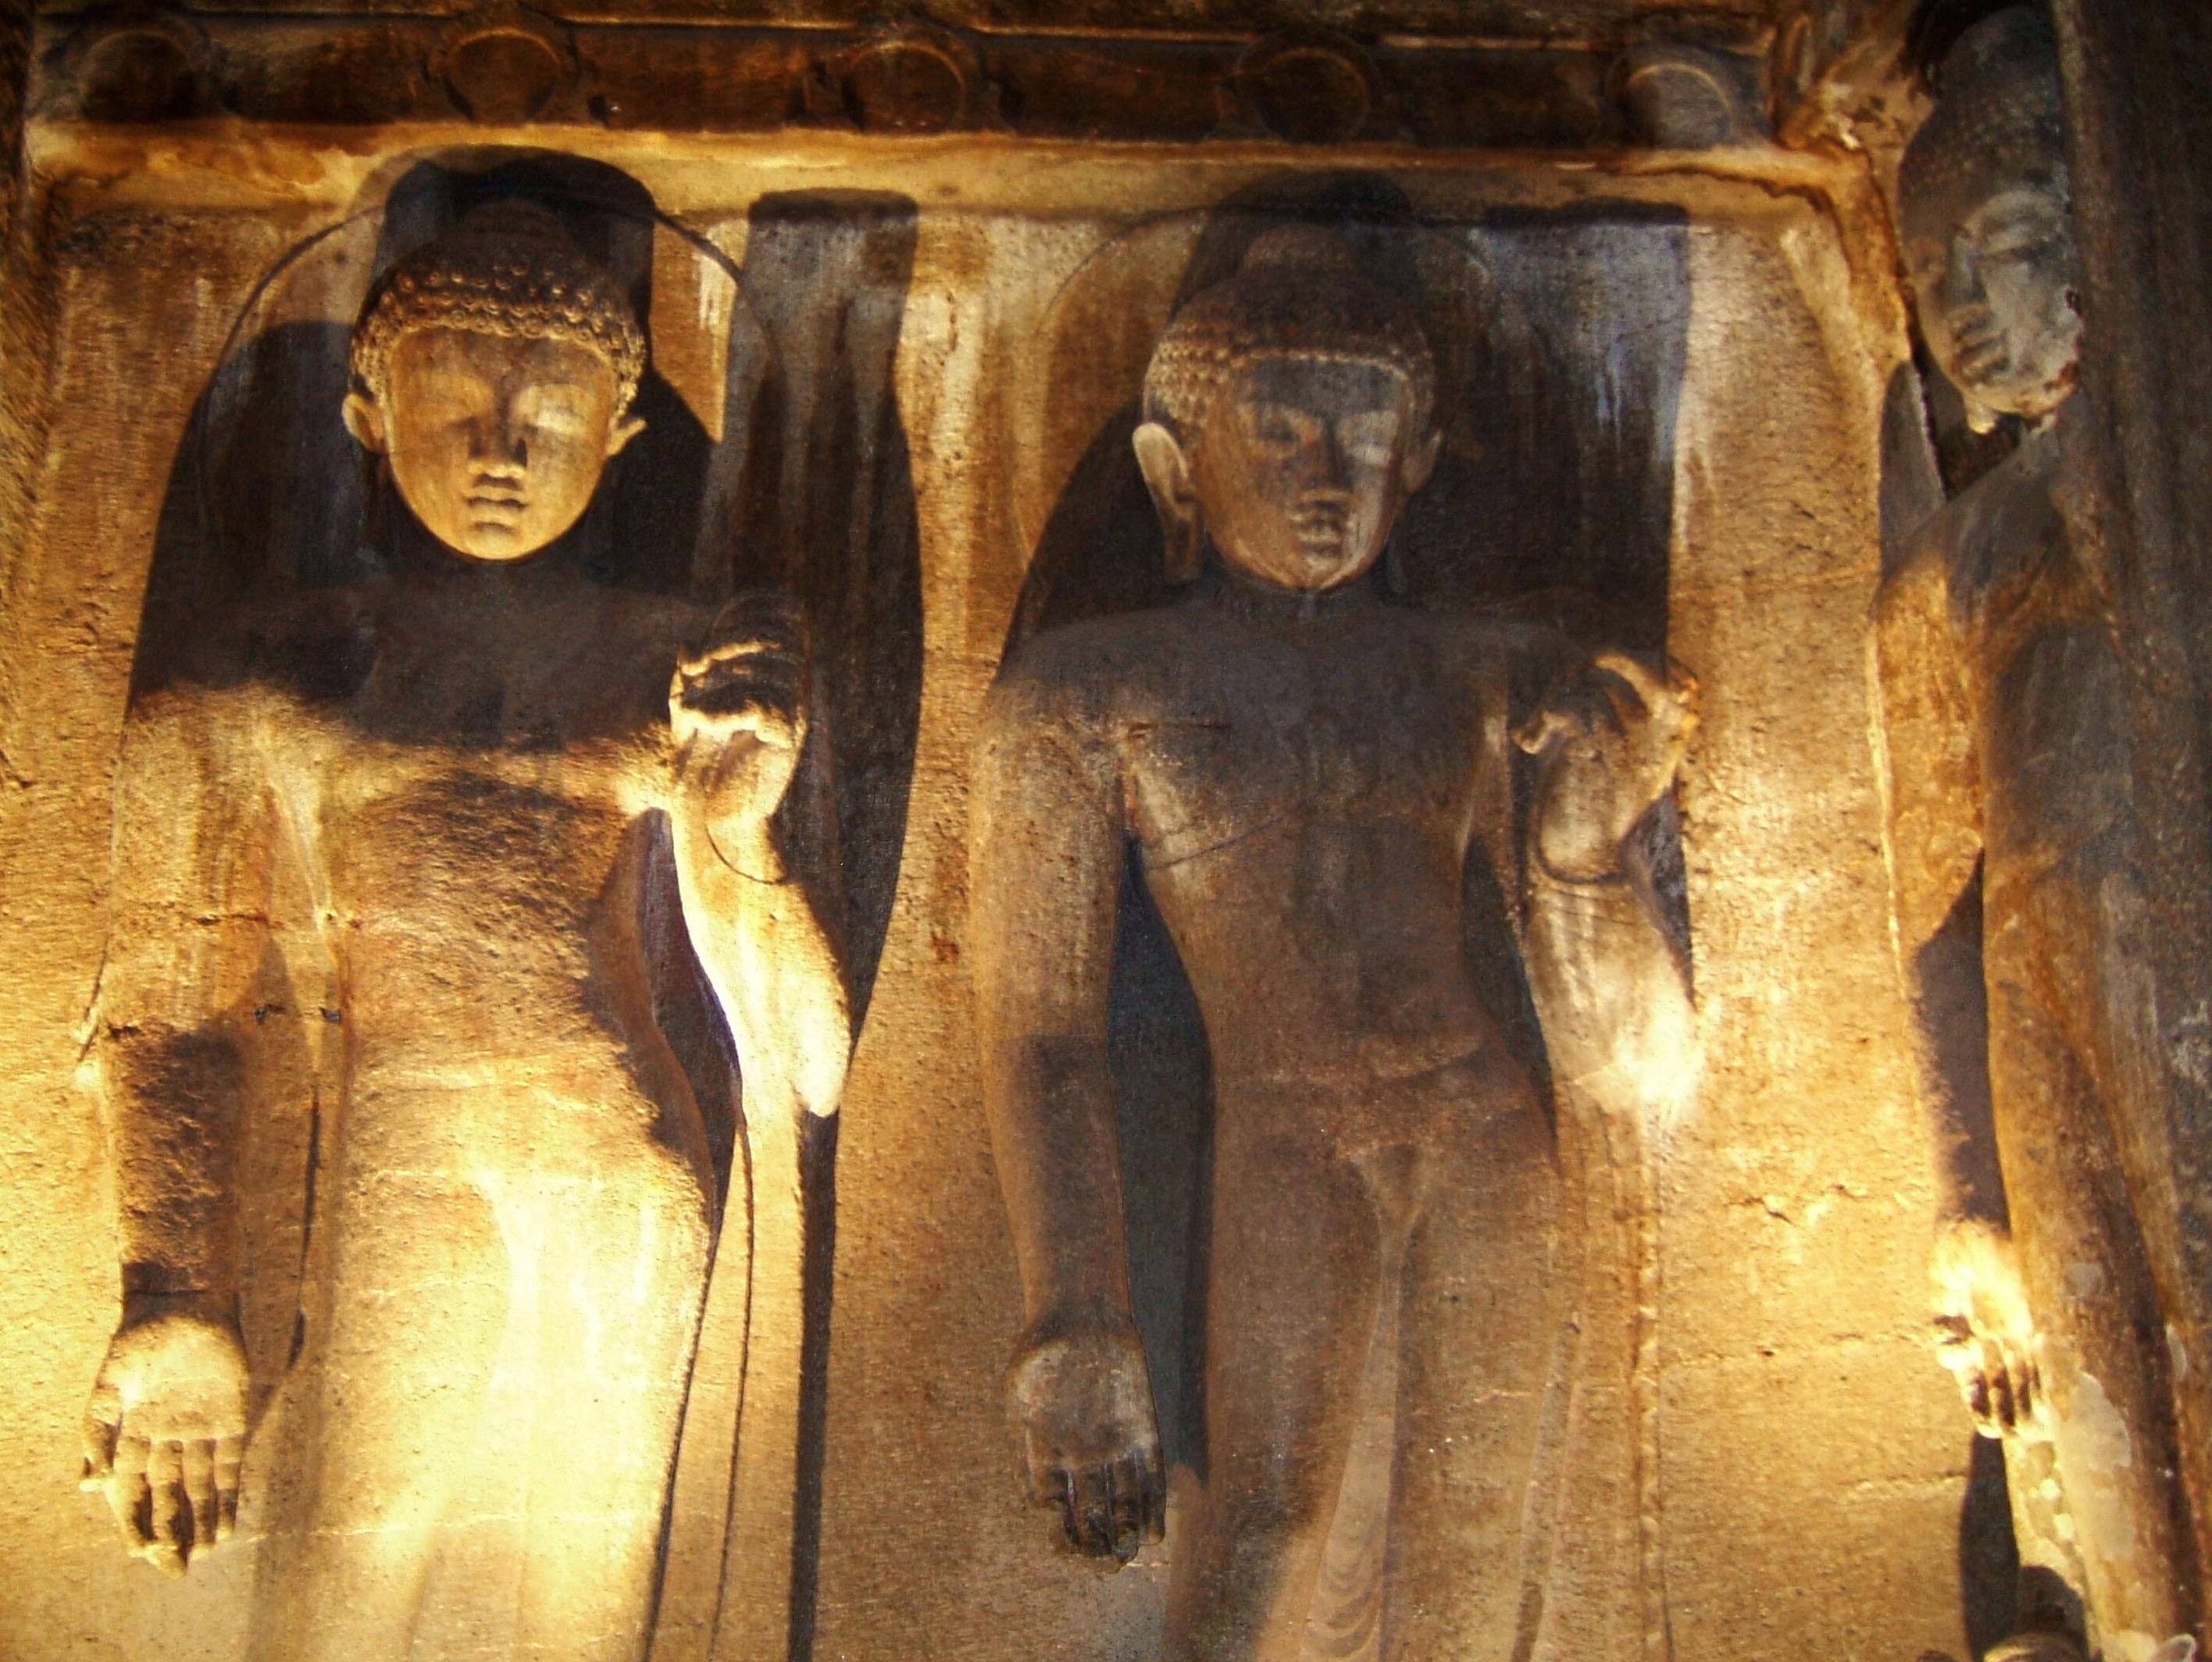 Marathwada Ajanta Caves Buddha carvings India Apr 2004 02